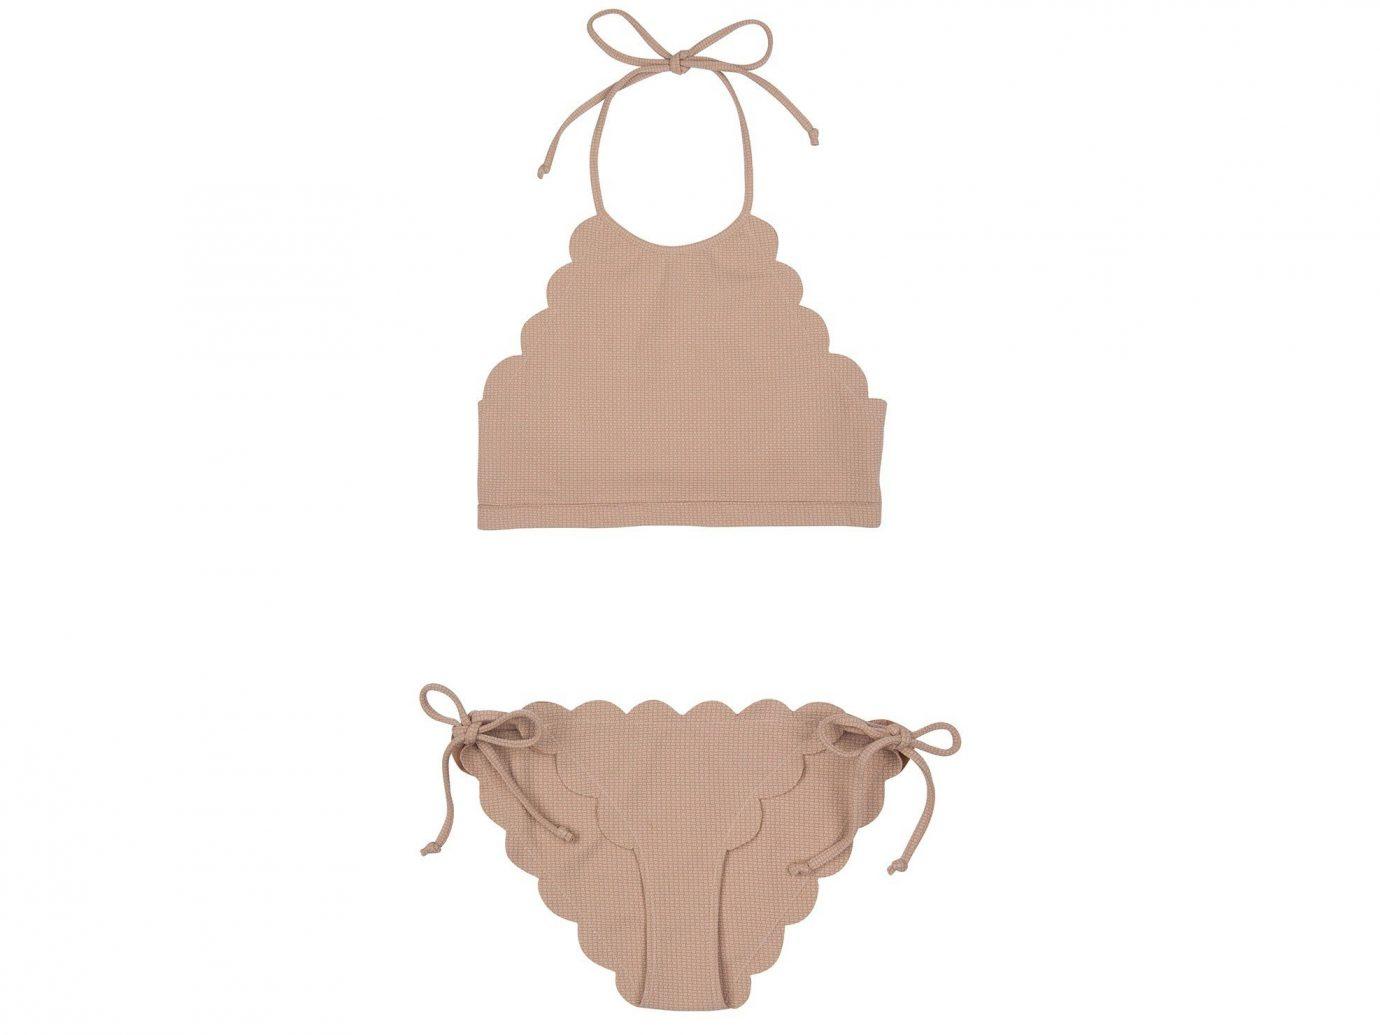 Style + Design product lighting bag light fixture illustration handbag beige lamp sconce lampshade